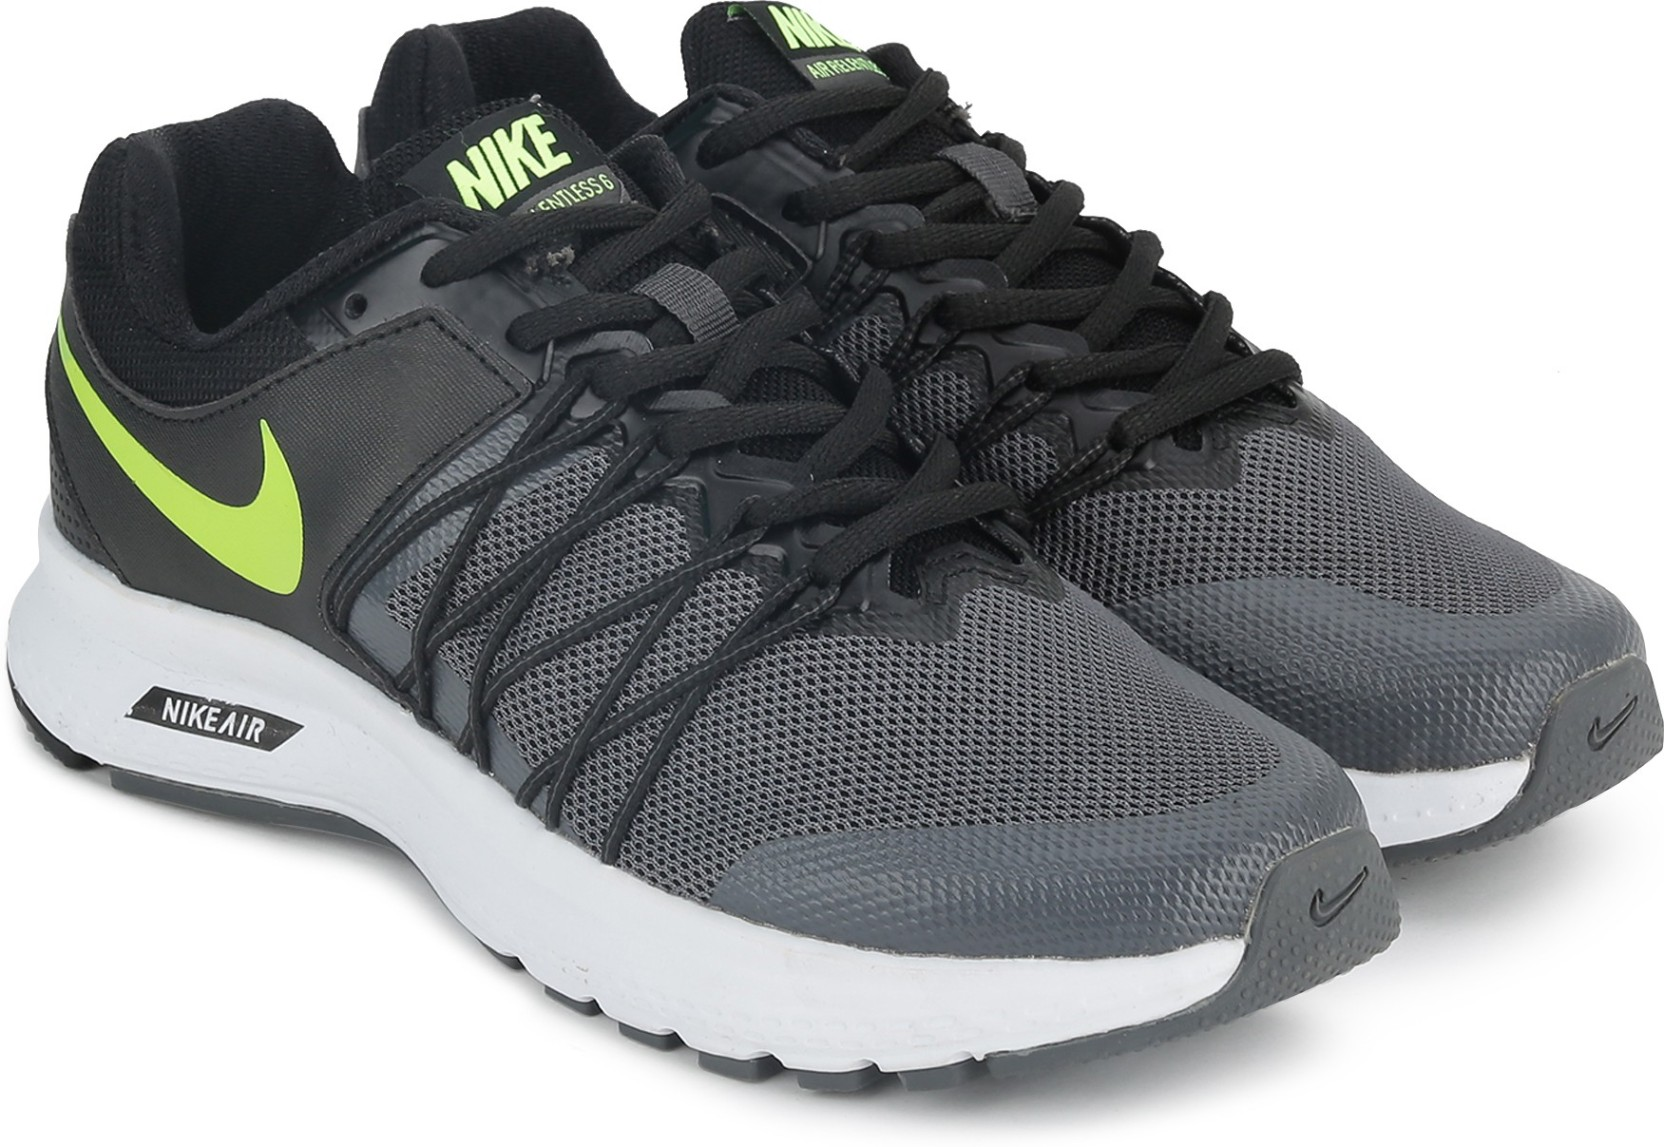 c2f664bca3a Nike AIR RELENTLESS 6 MSL Running Shoes For Men - Buy BLACK ...